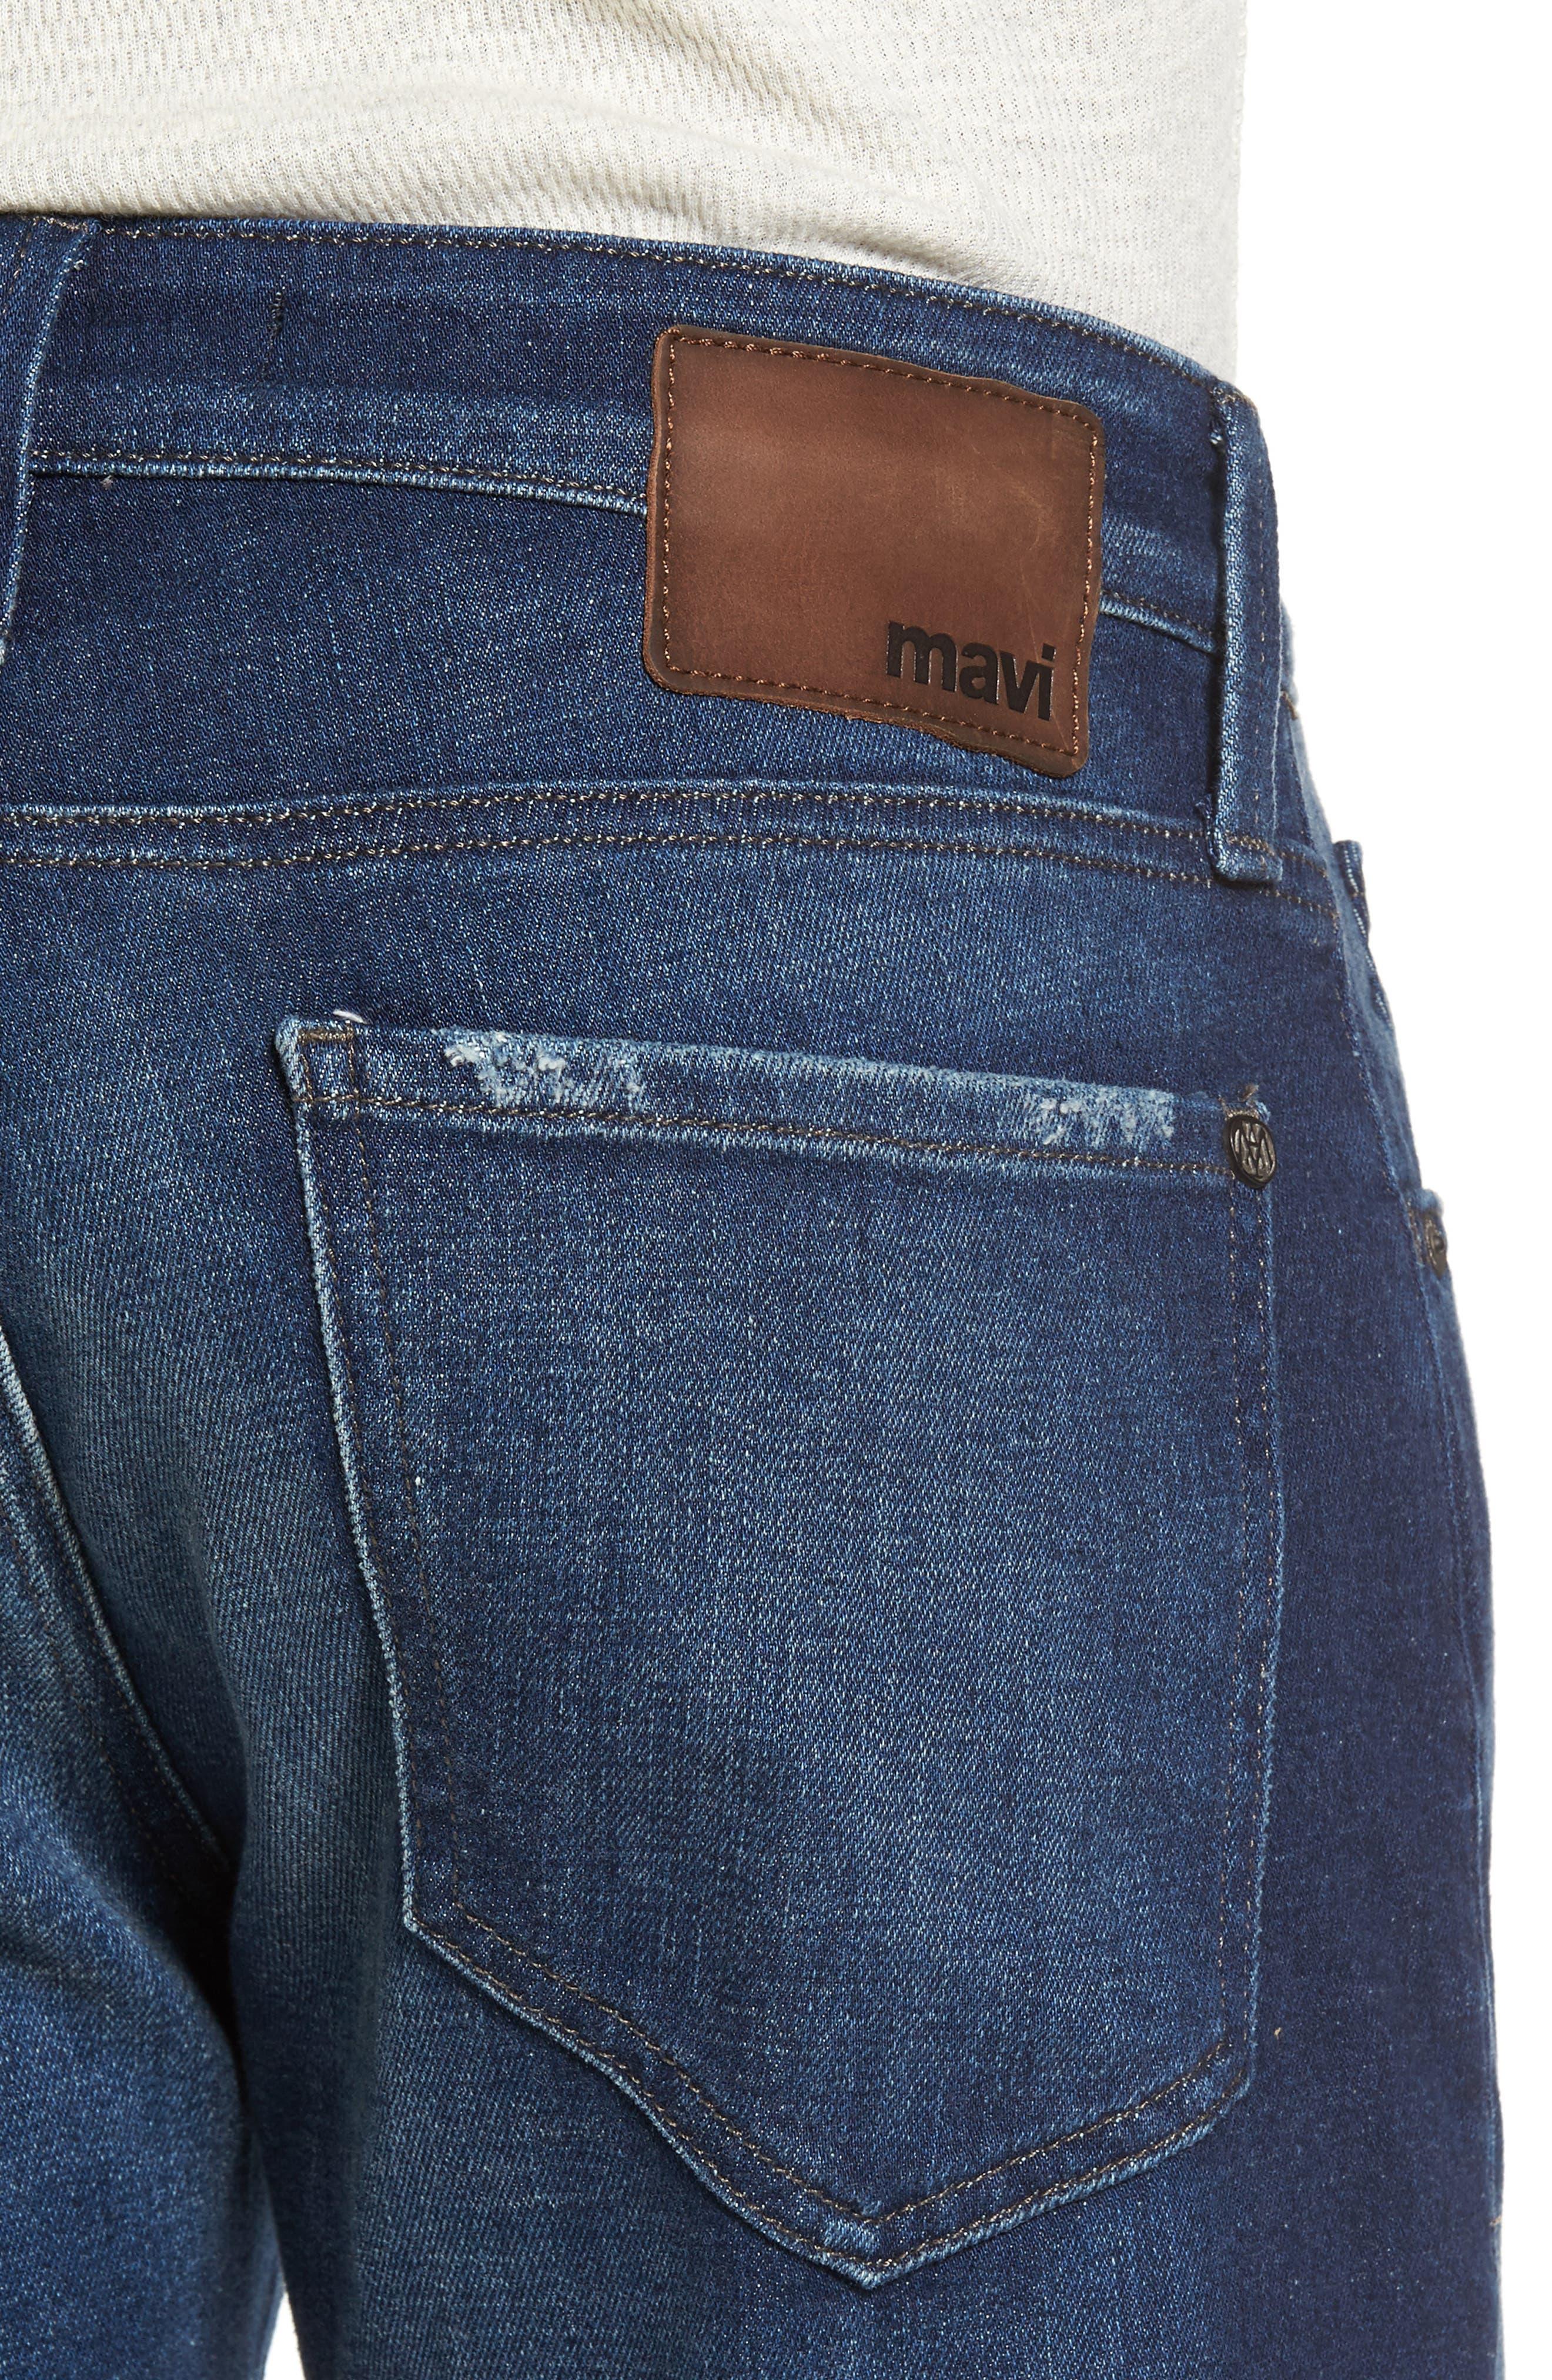 Jake Easy Slim Fit Jeans,                             Alternate thumbnail 4, color,                             401